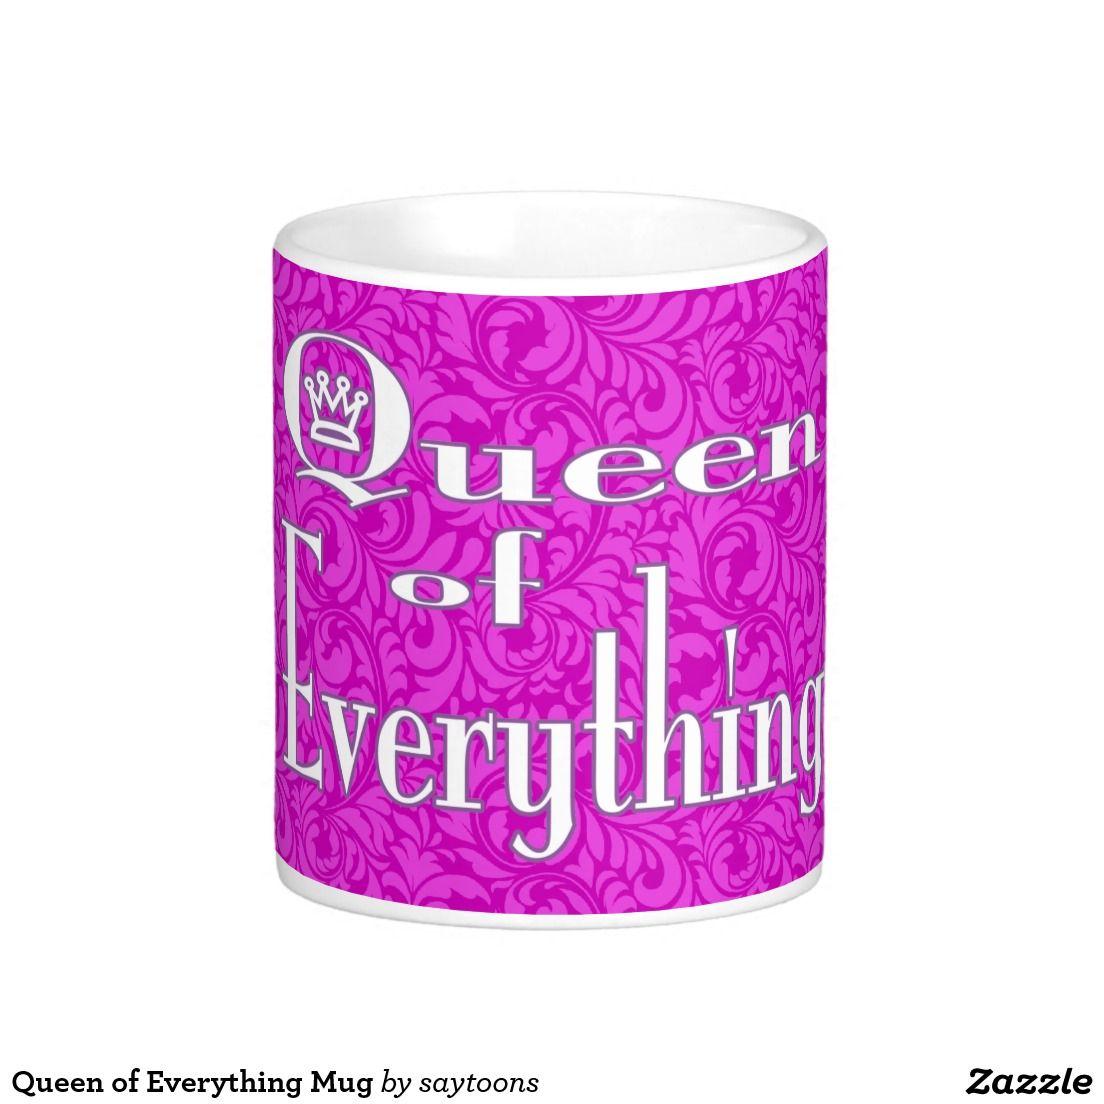 Queen of Everything Mug #bossladydesigns #zazzle